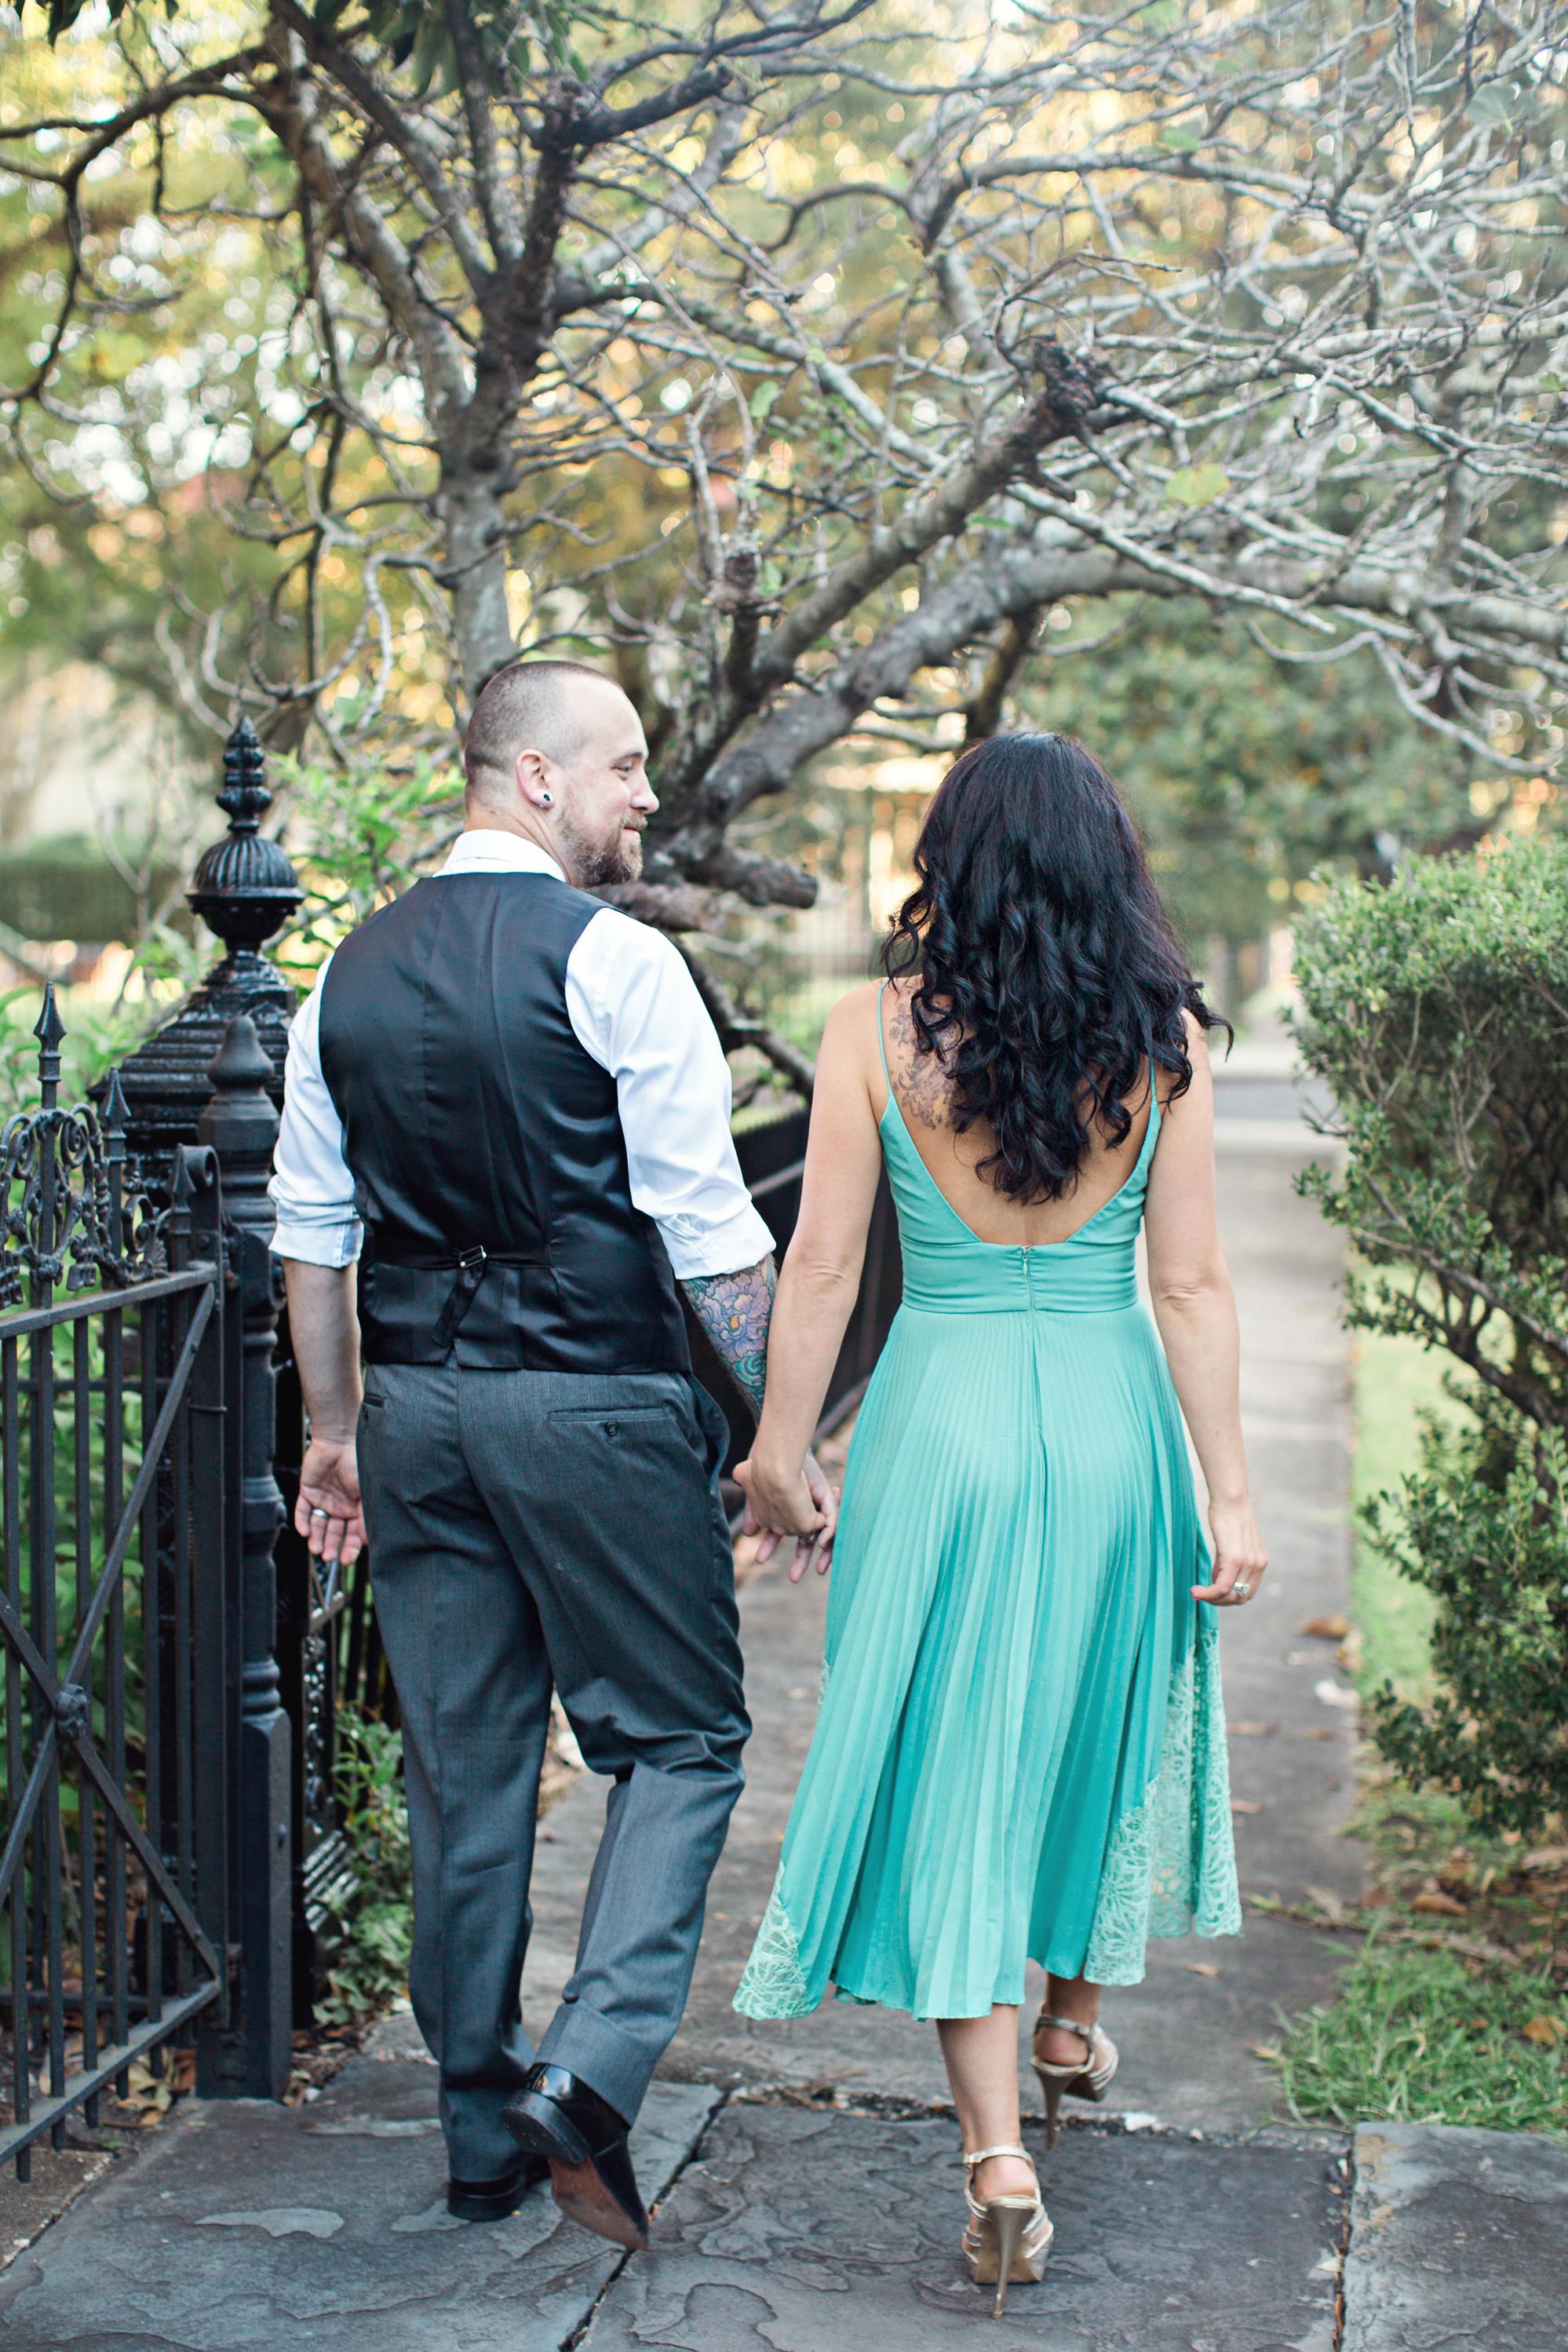 CindyGiovagnoliPhotography_Seattle_Washington_PNW_Couple_Engagement_Portrait_Photography-013.jpg